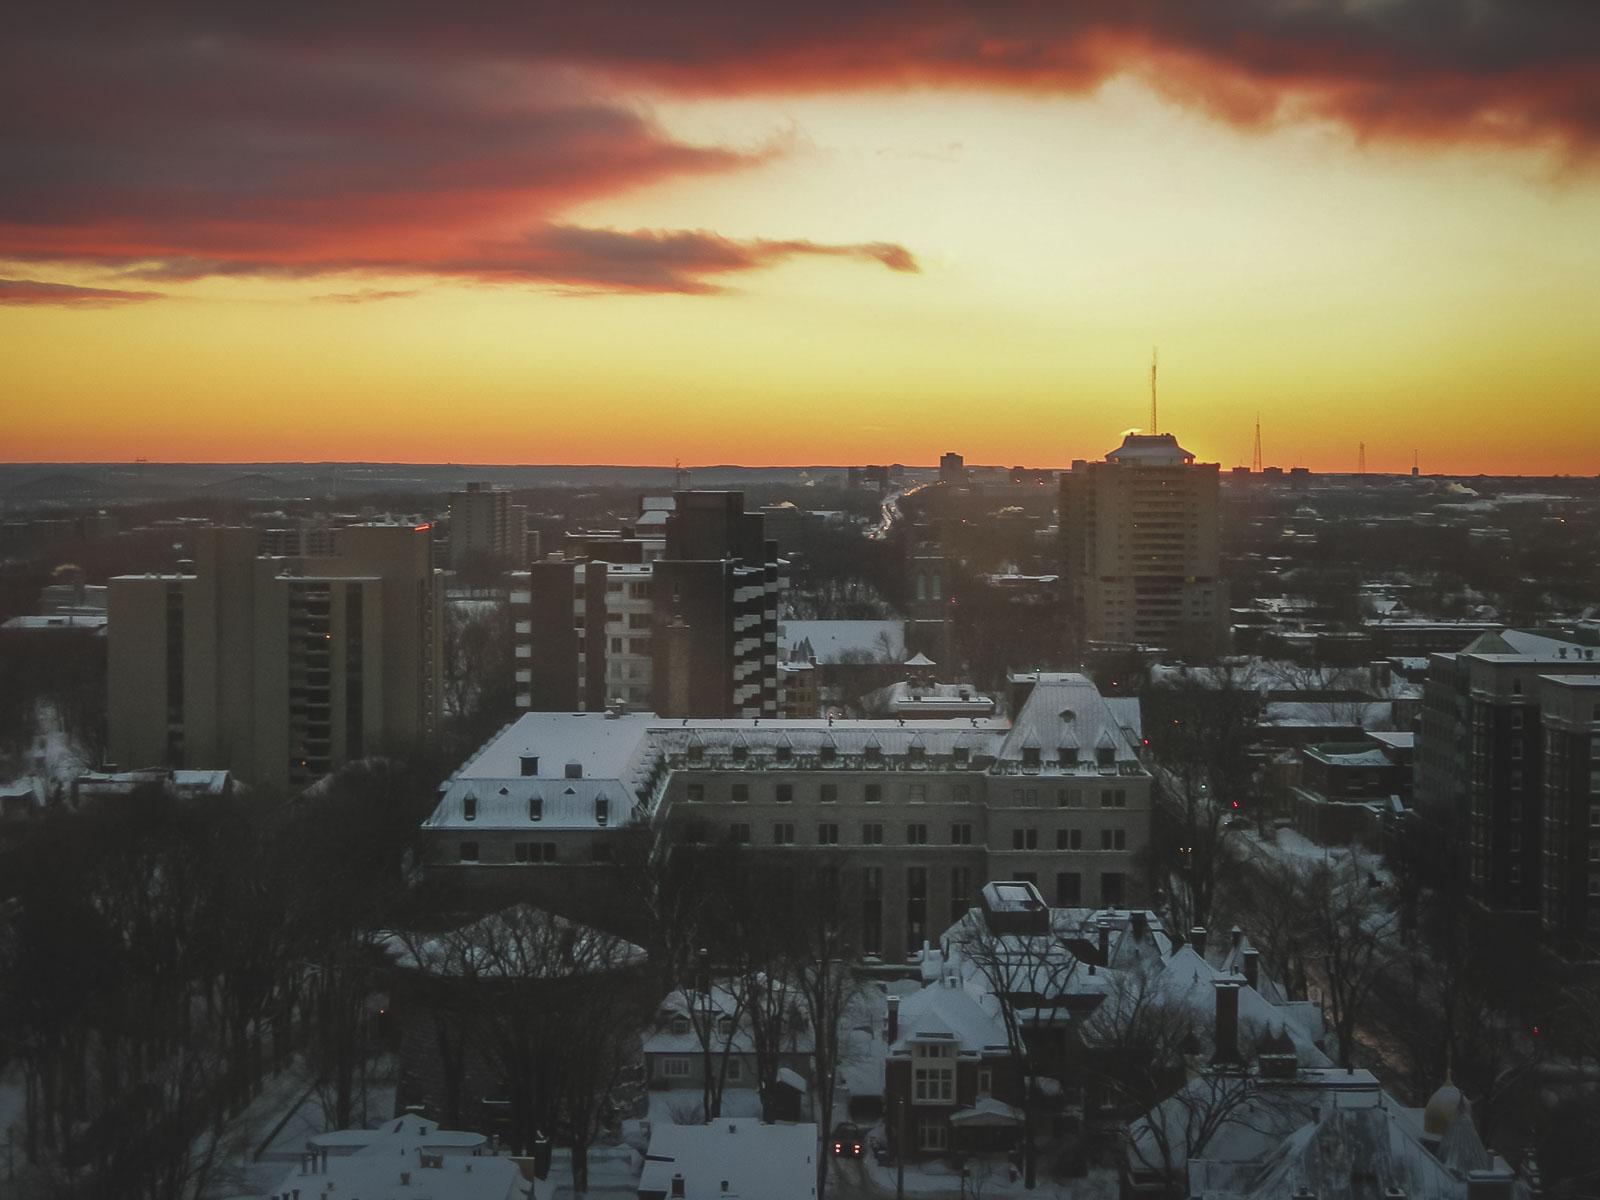 Downtown Quebec City